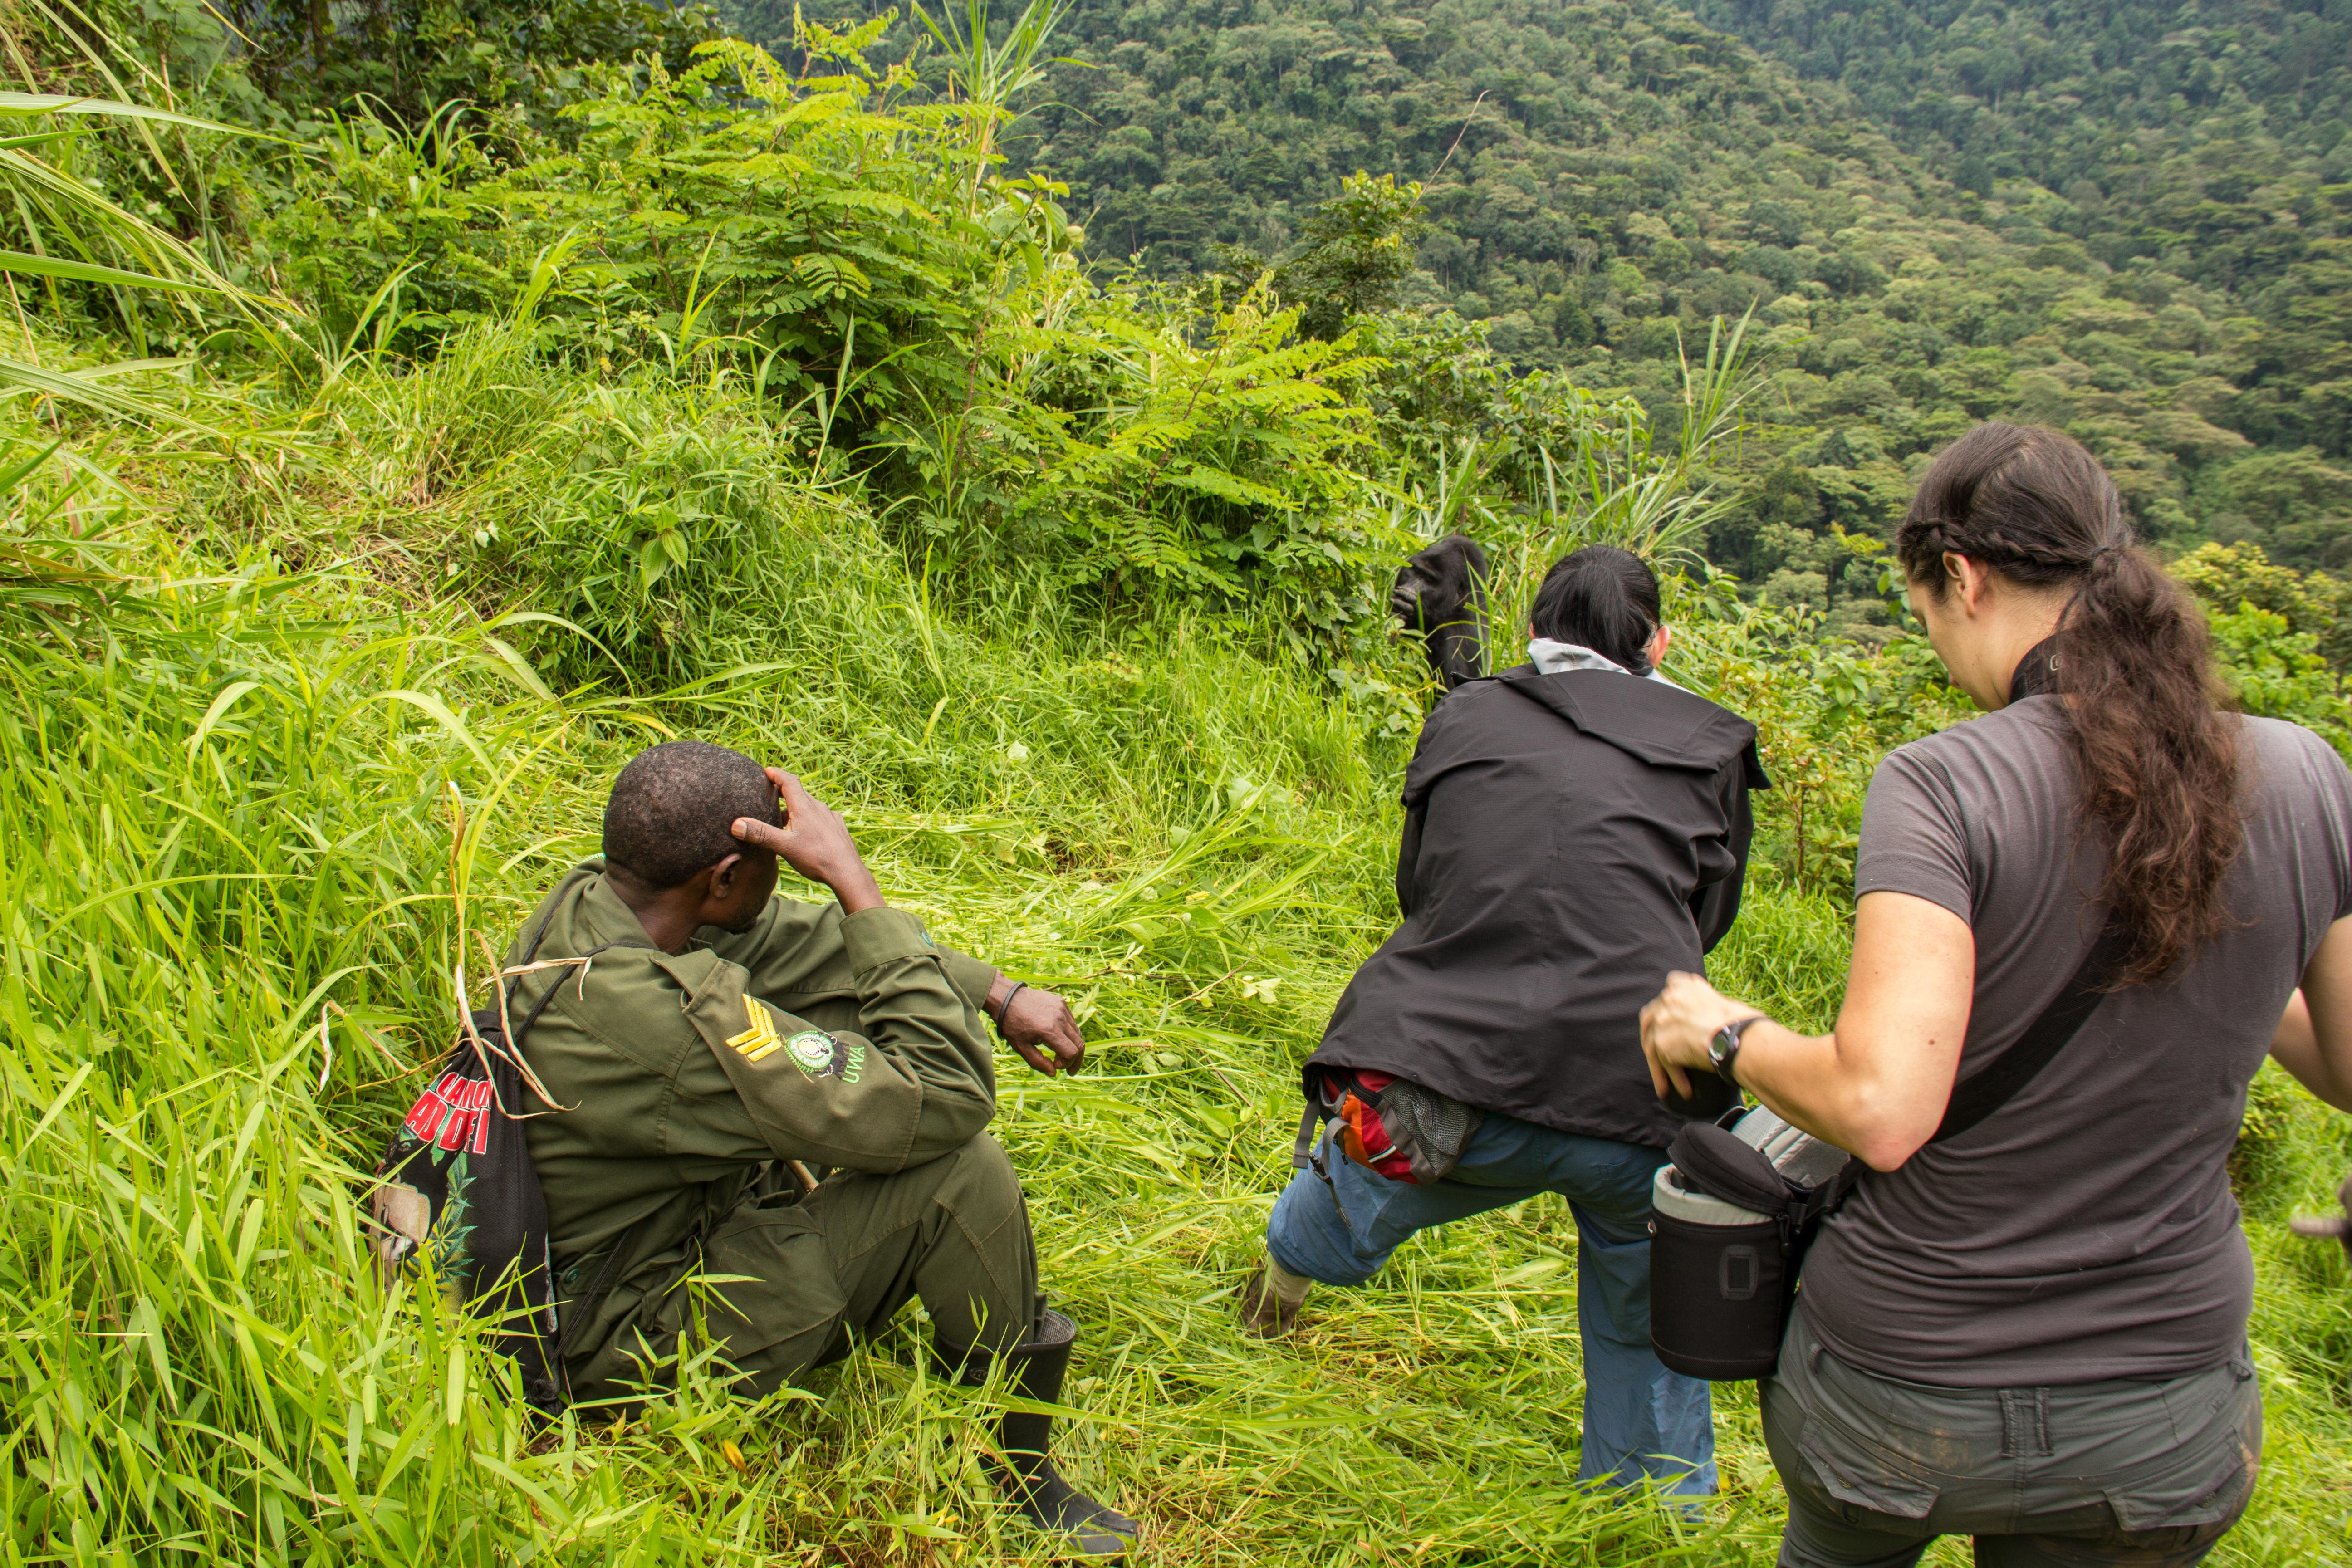 3 days Uganda gorilla trekking safari Bwindi Impenetrable National Park